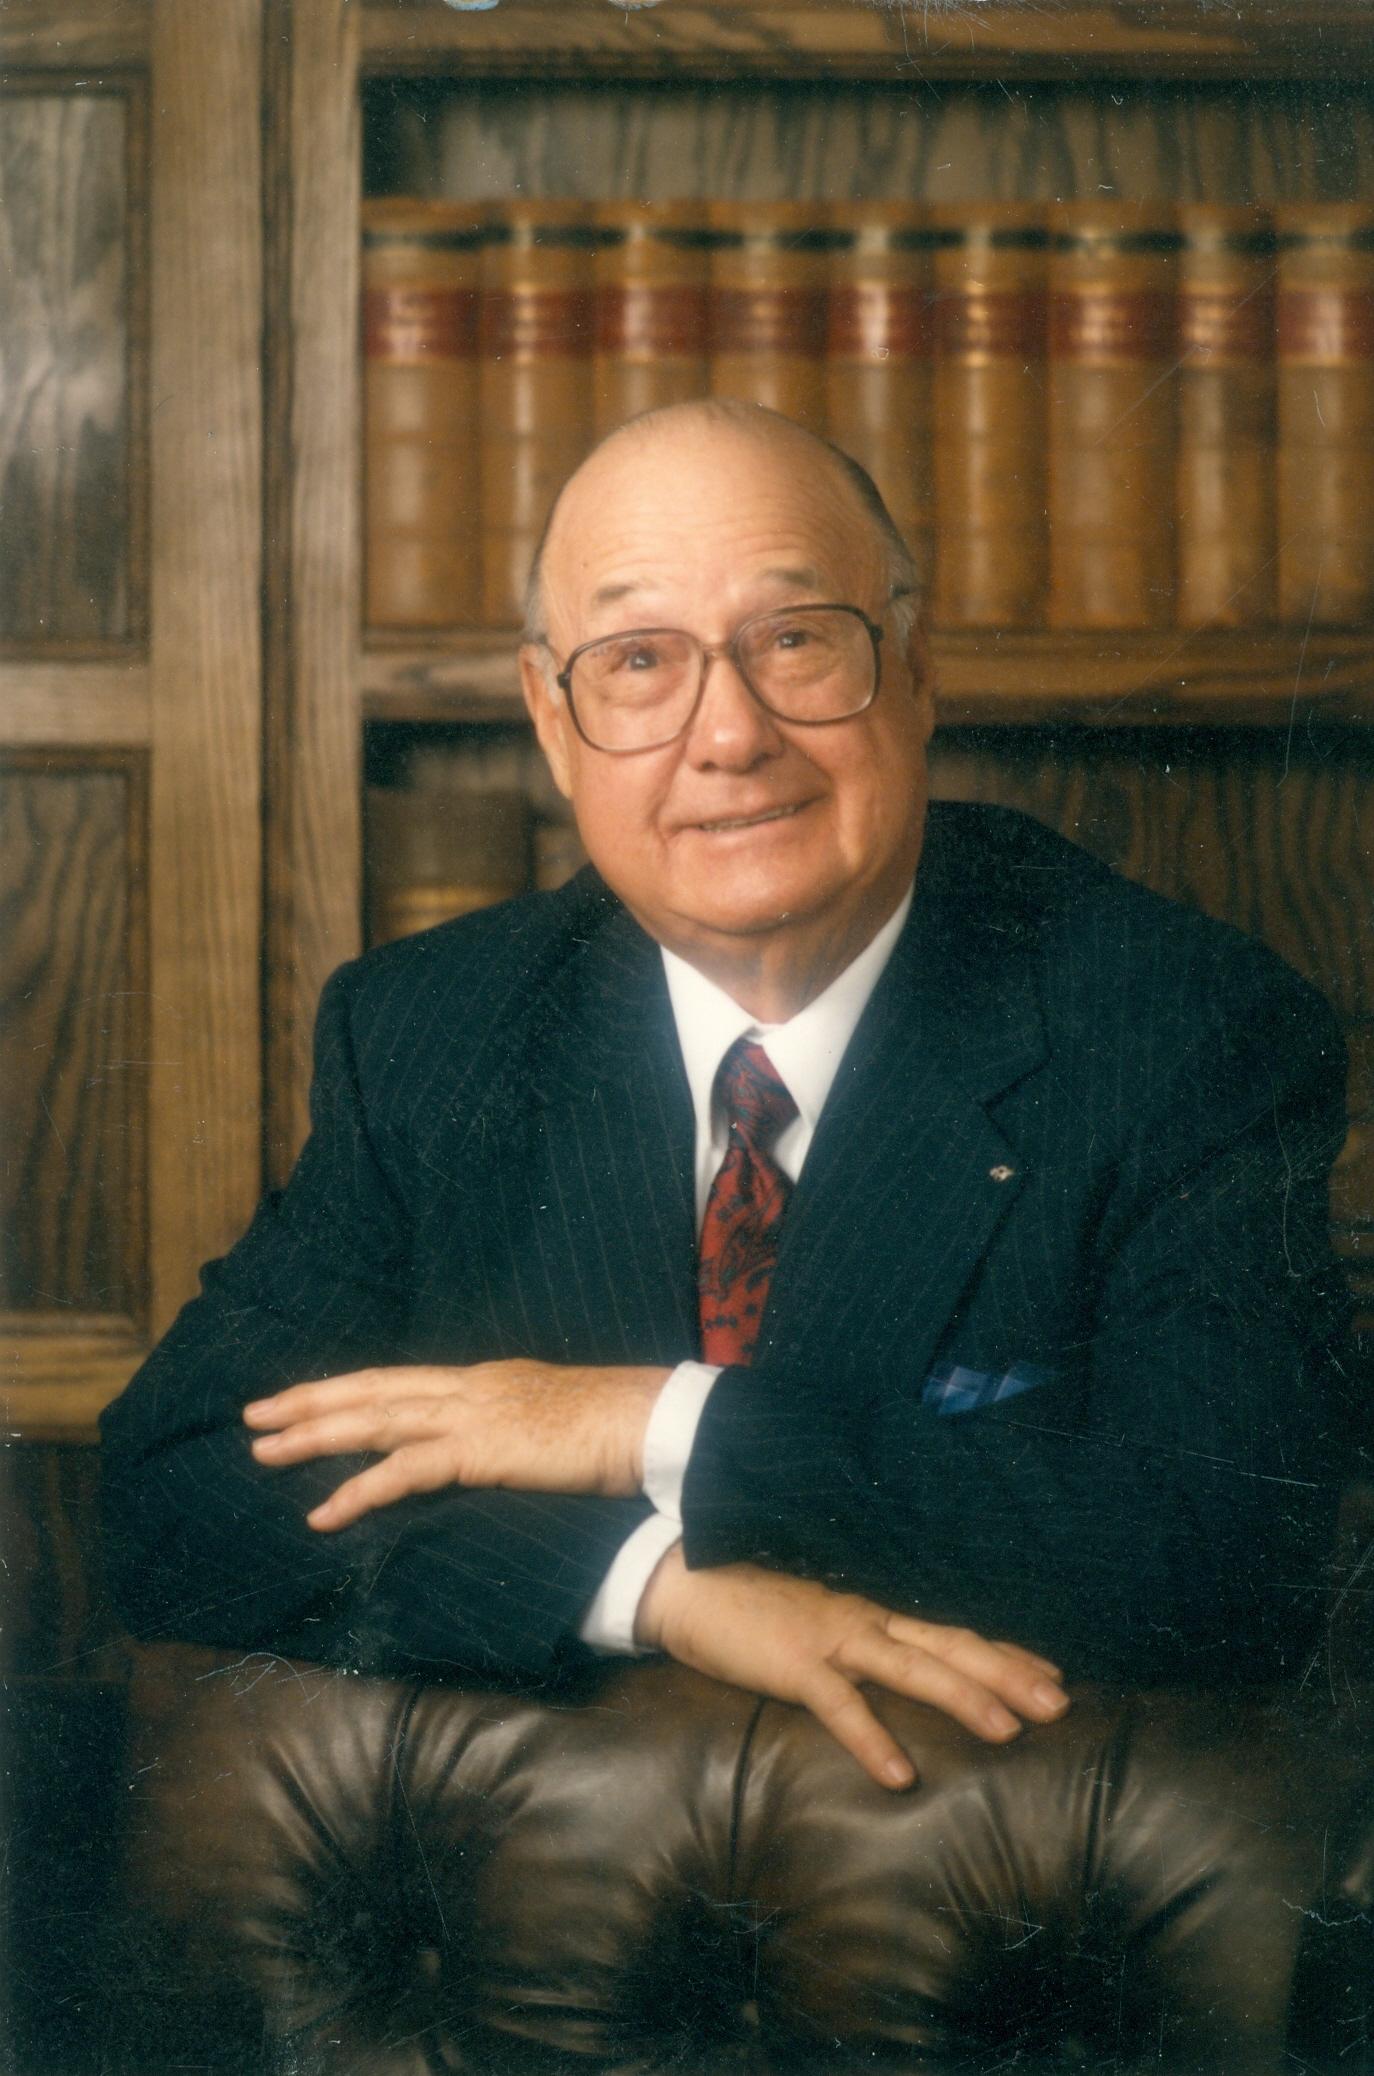 George Boone McMurtery